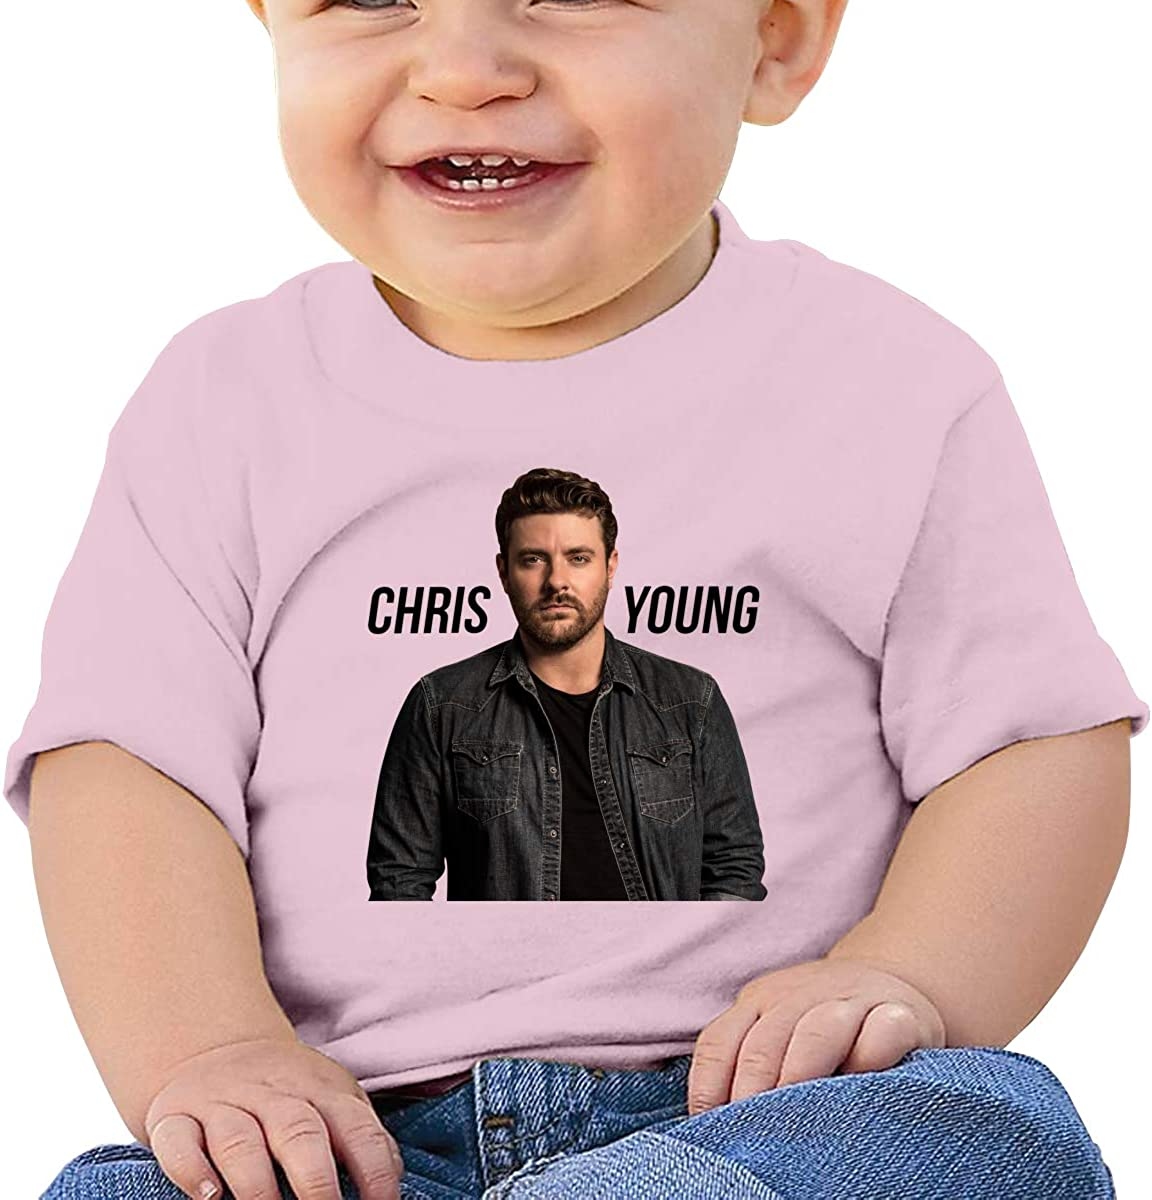 Honshang Chris Young Pink Tshirts for Infant Tshirts